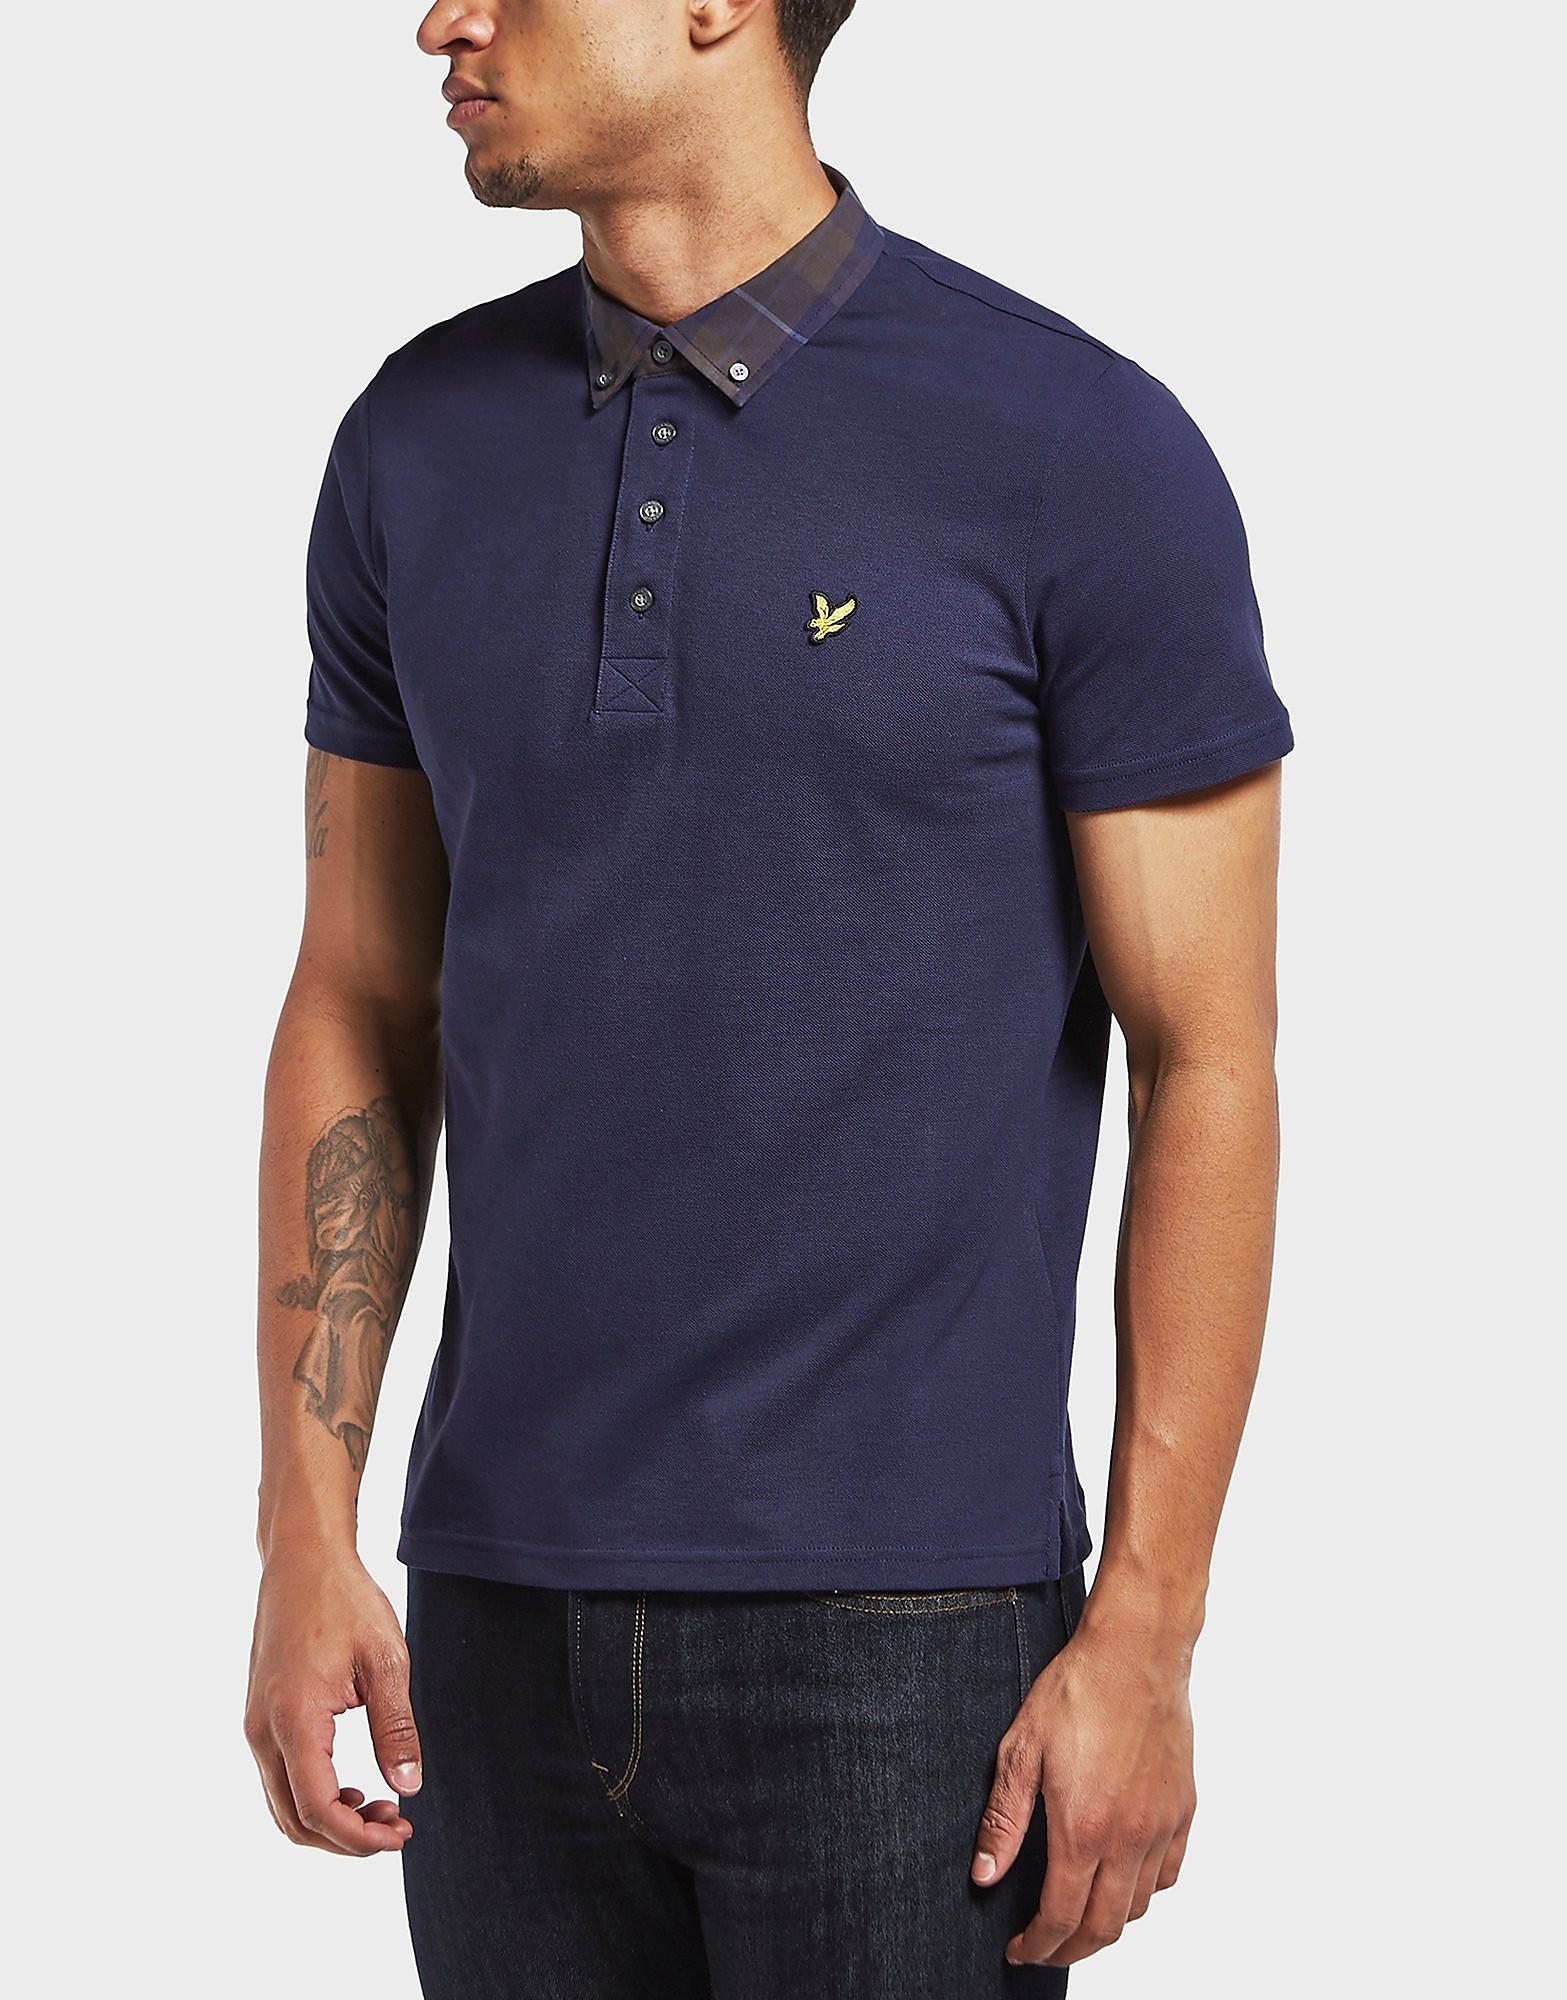 Lyle & Scott Check Collar Short Sleeve Polo Shirt